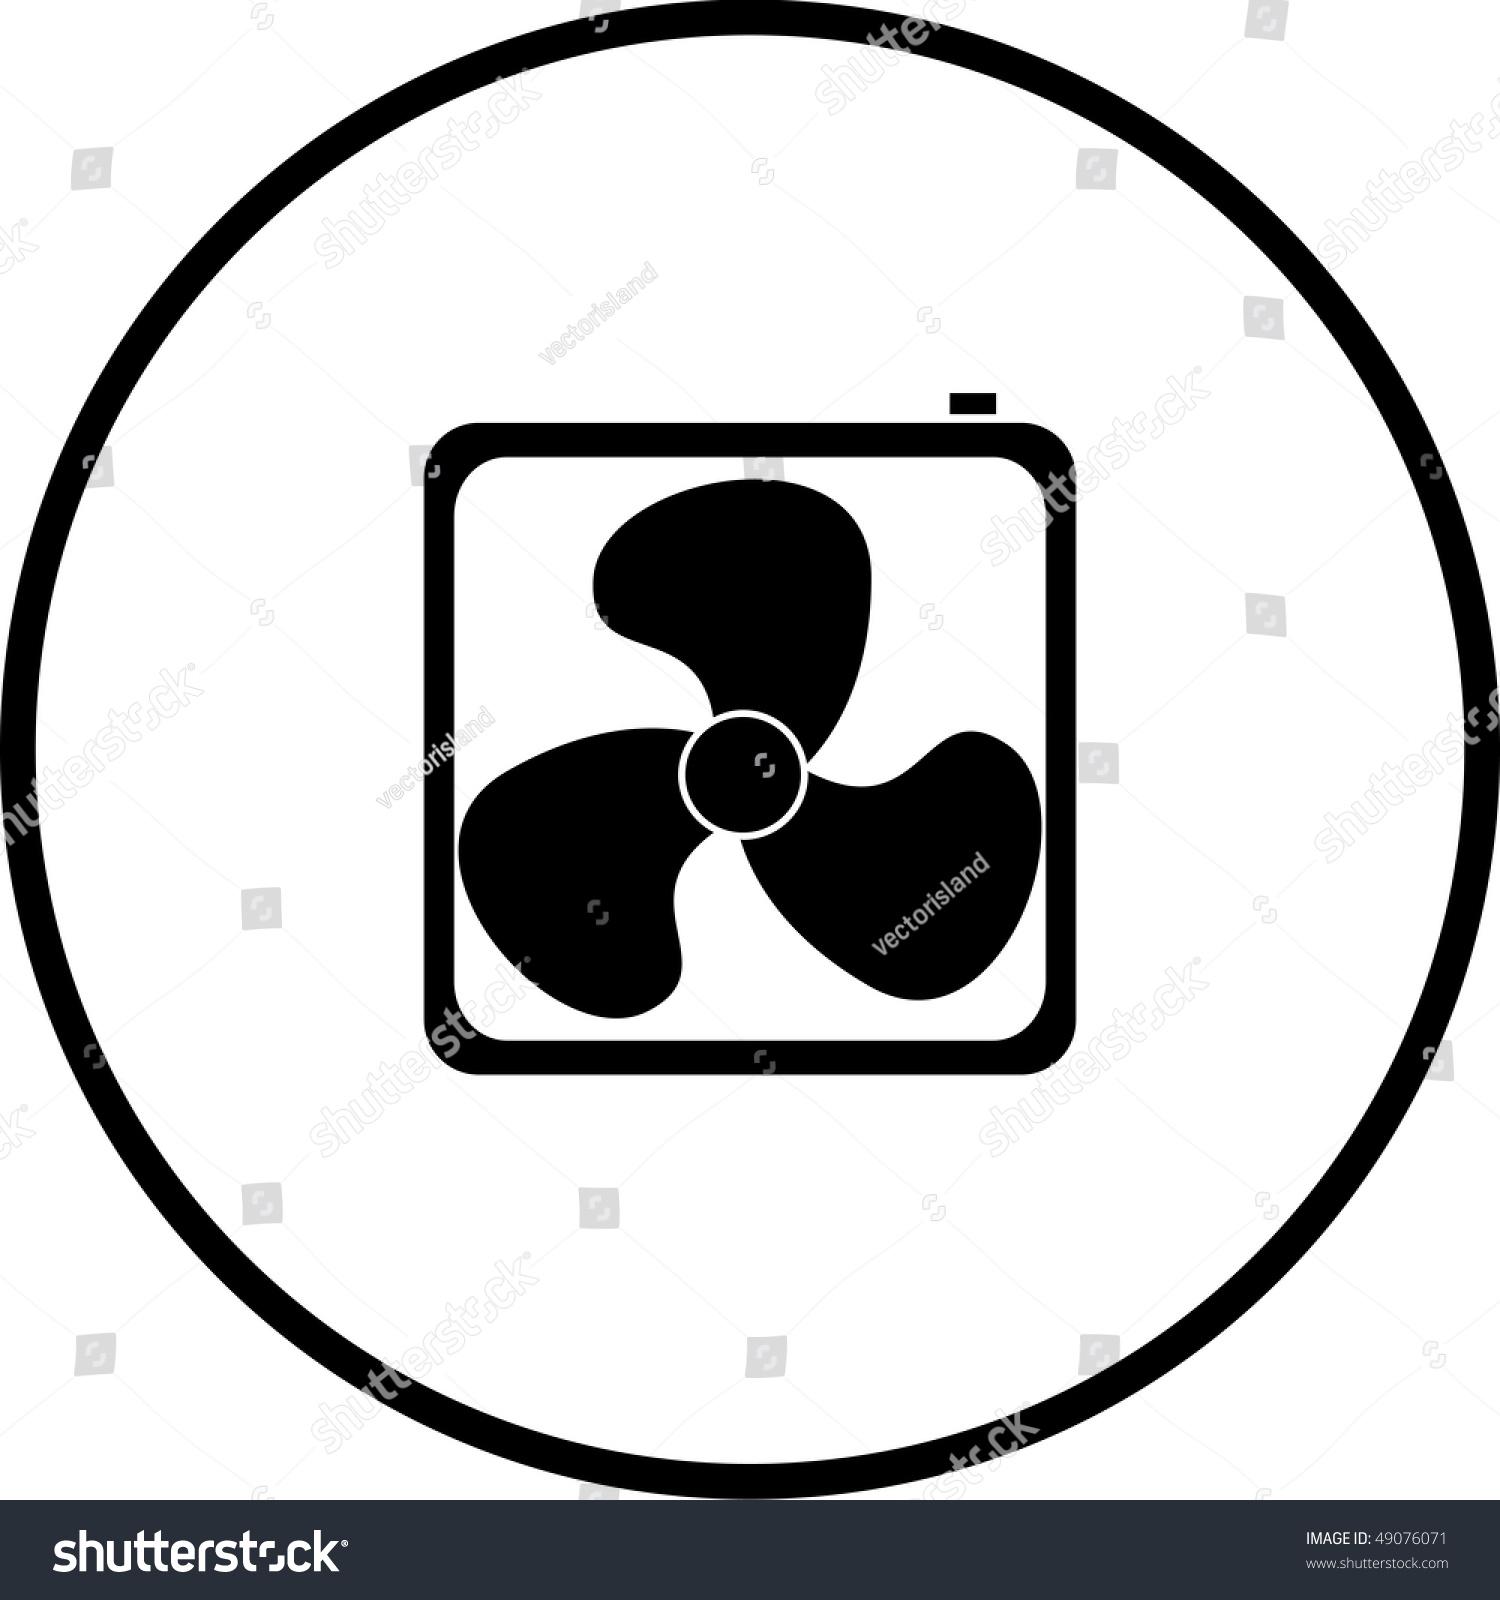 Exhaust Fan Symbol : Square fan symbol stock illustration shutterstock